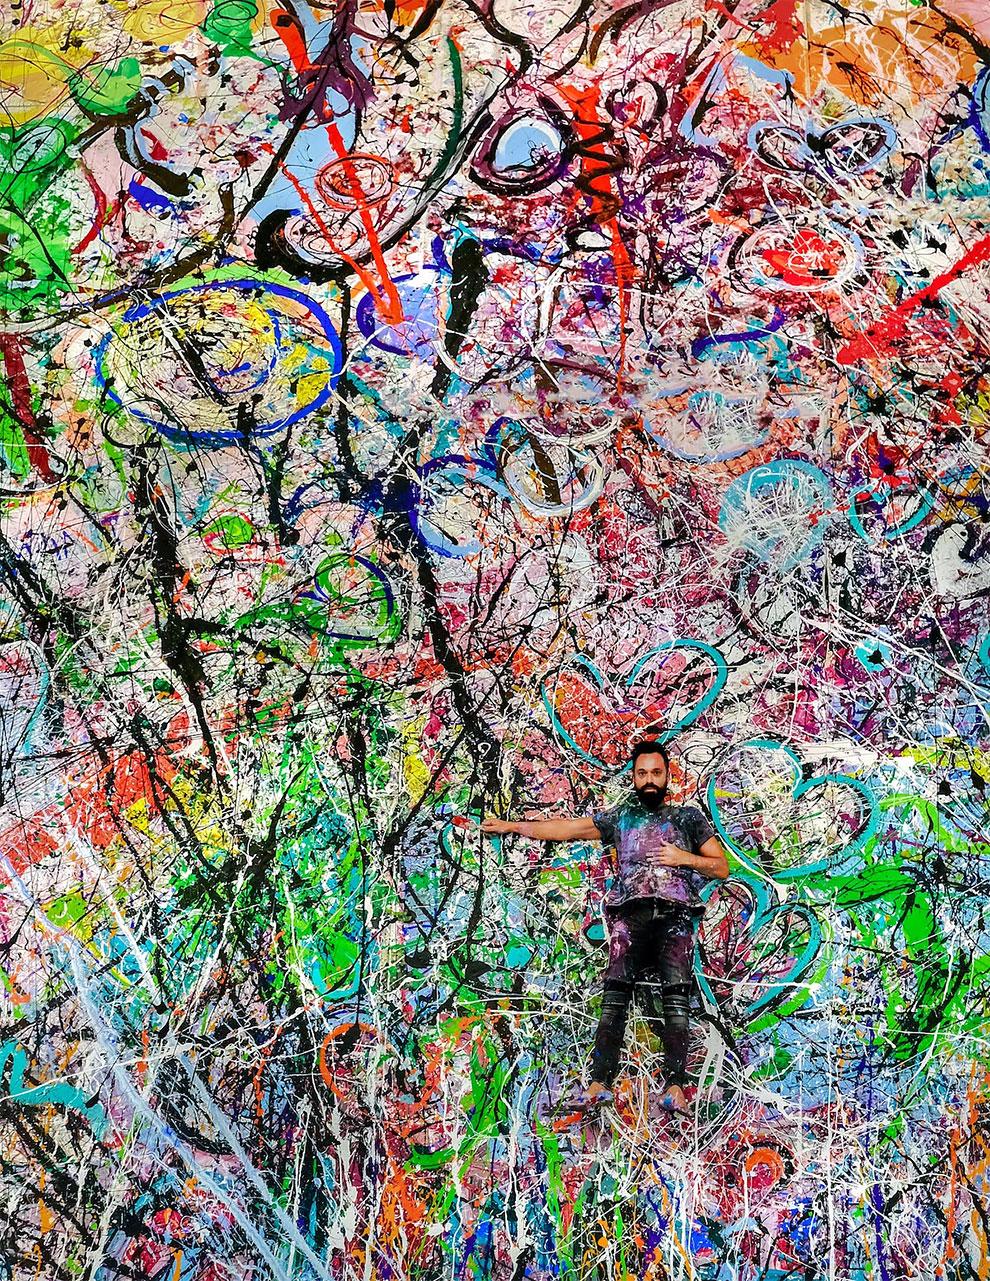 sachi jafari artista cuadroc gigante humanidad